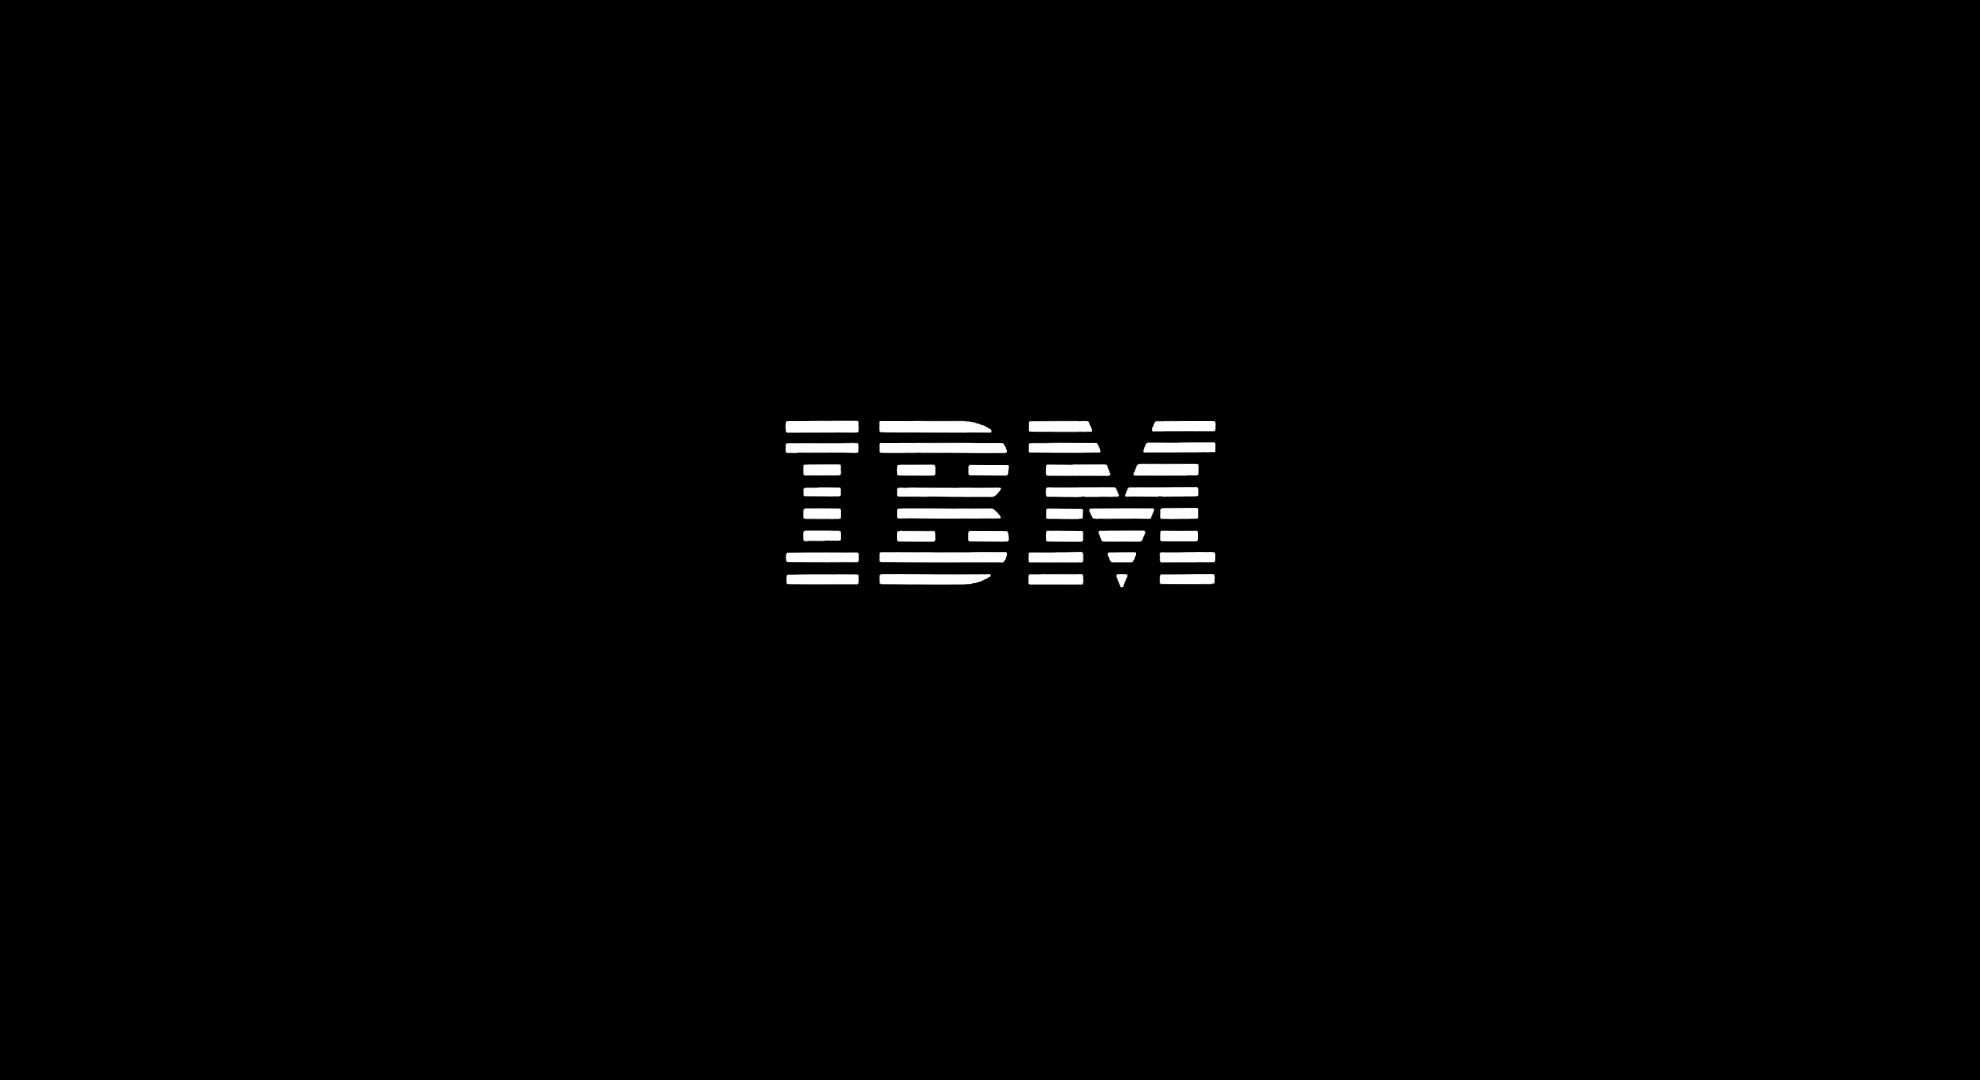 Ibm Wallpaper 0 1980x1080